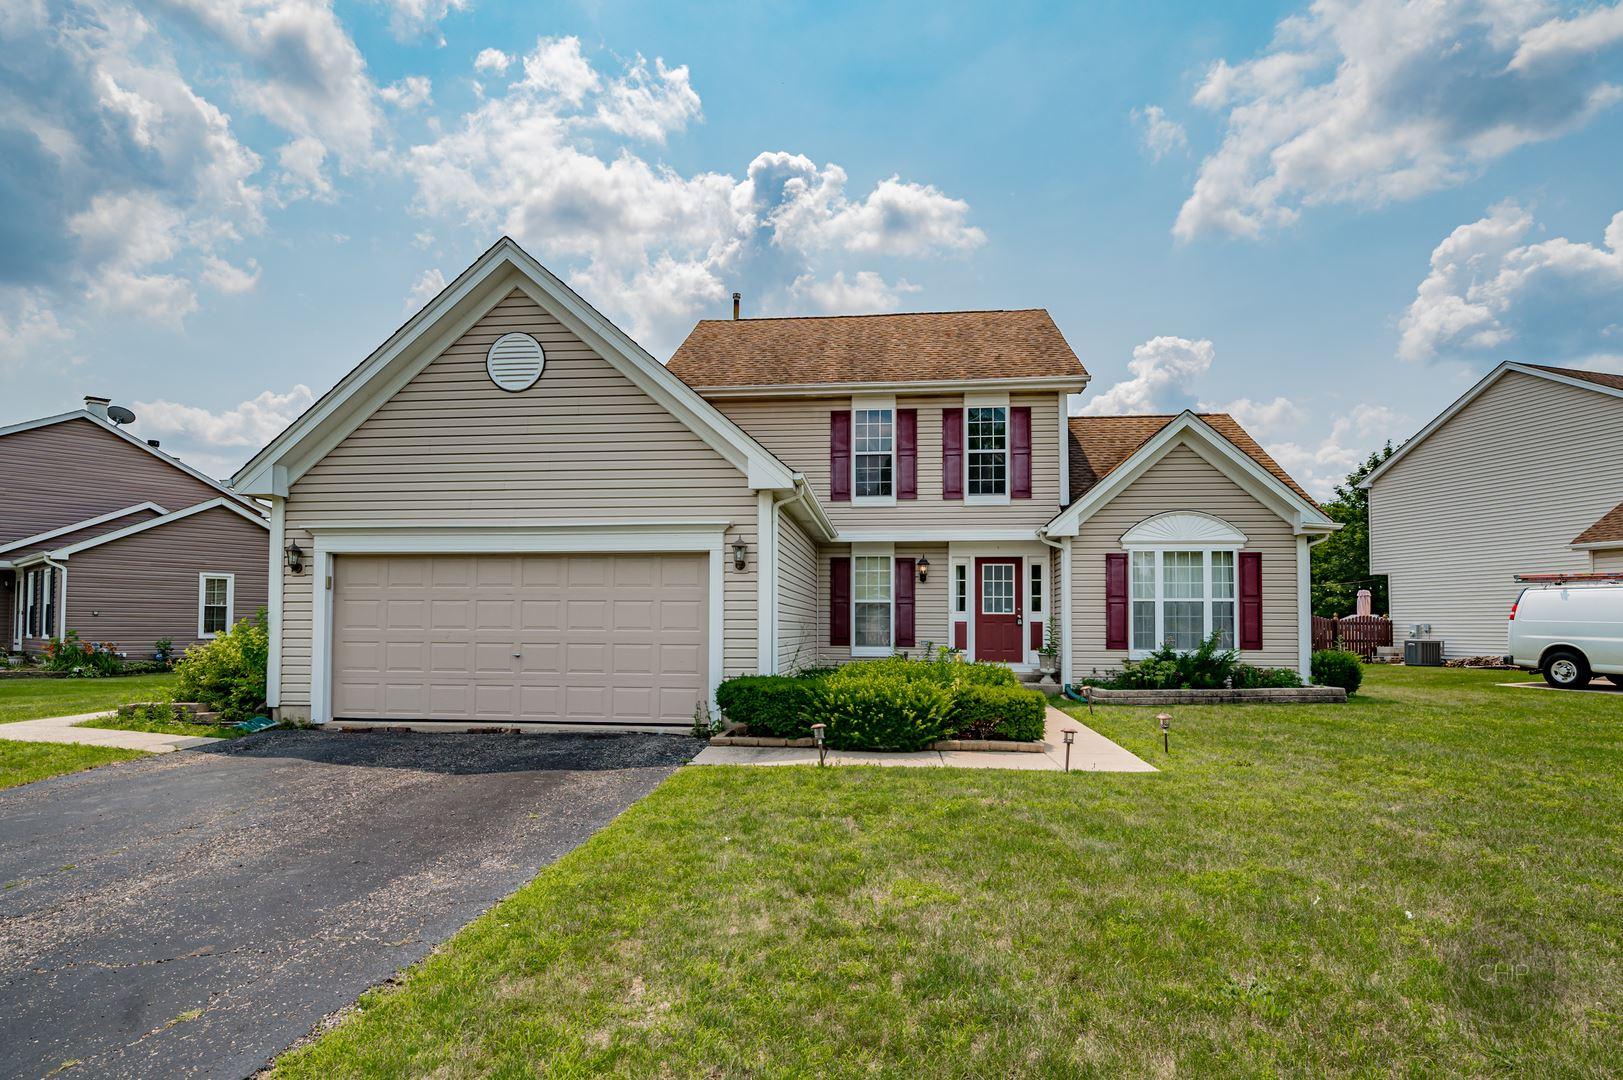 Photo of 135 Sandalwood Lane, Bolingbrook, IL 60440 (MLS # 11162289)